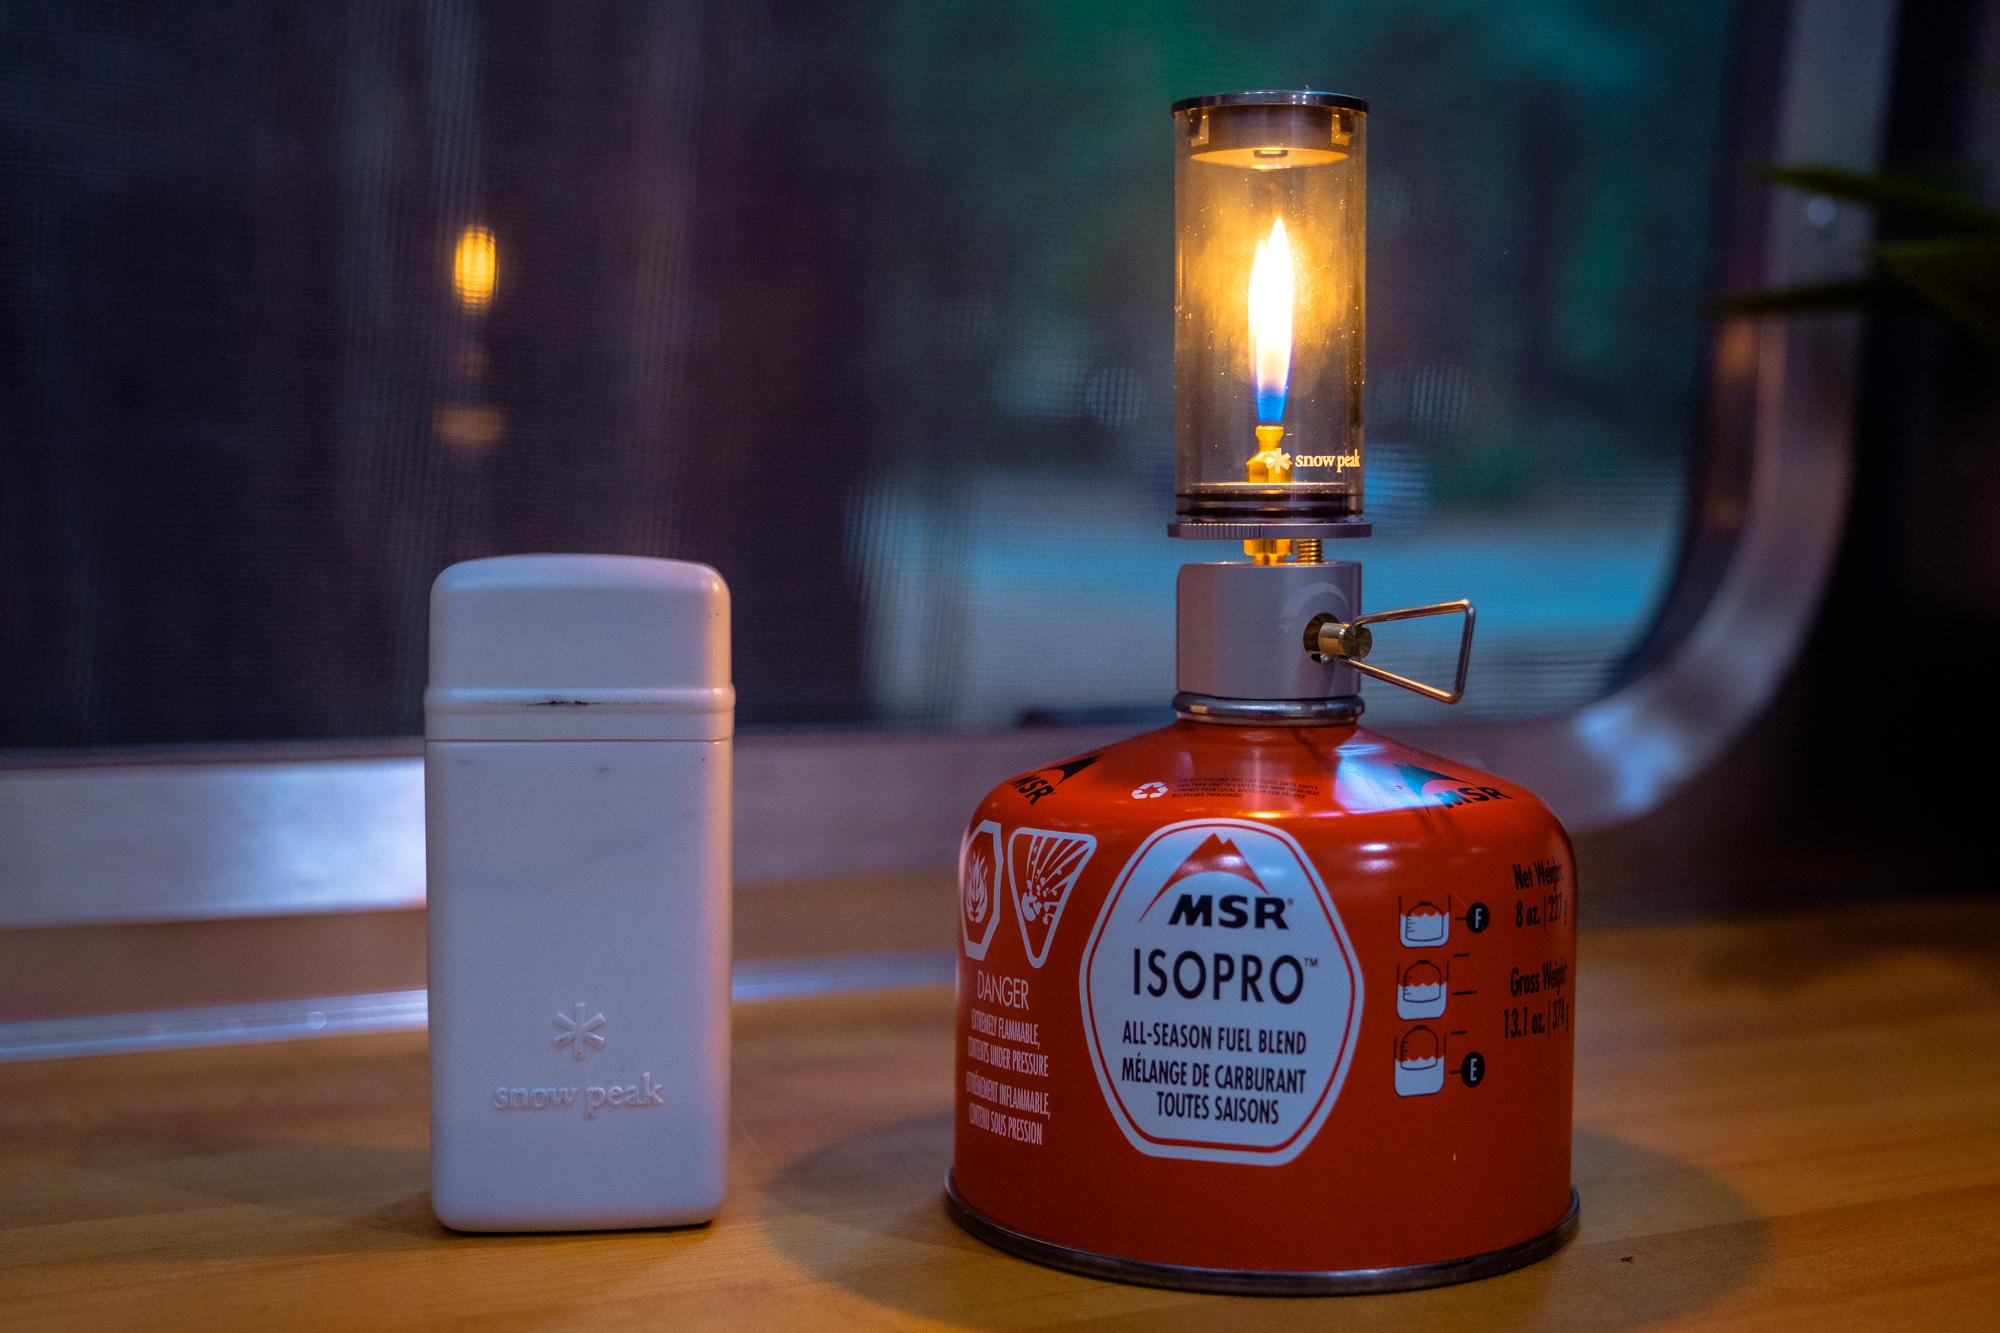 Snow Peak Mini Flamme Lanterne